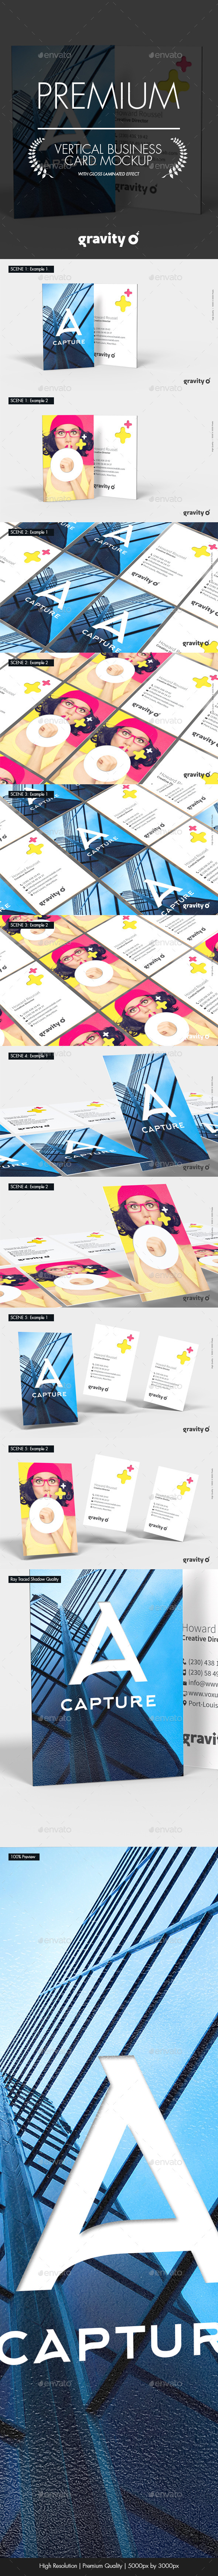 Vertical Business Card Mockup - Product Mock-Ups Graphics